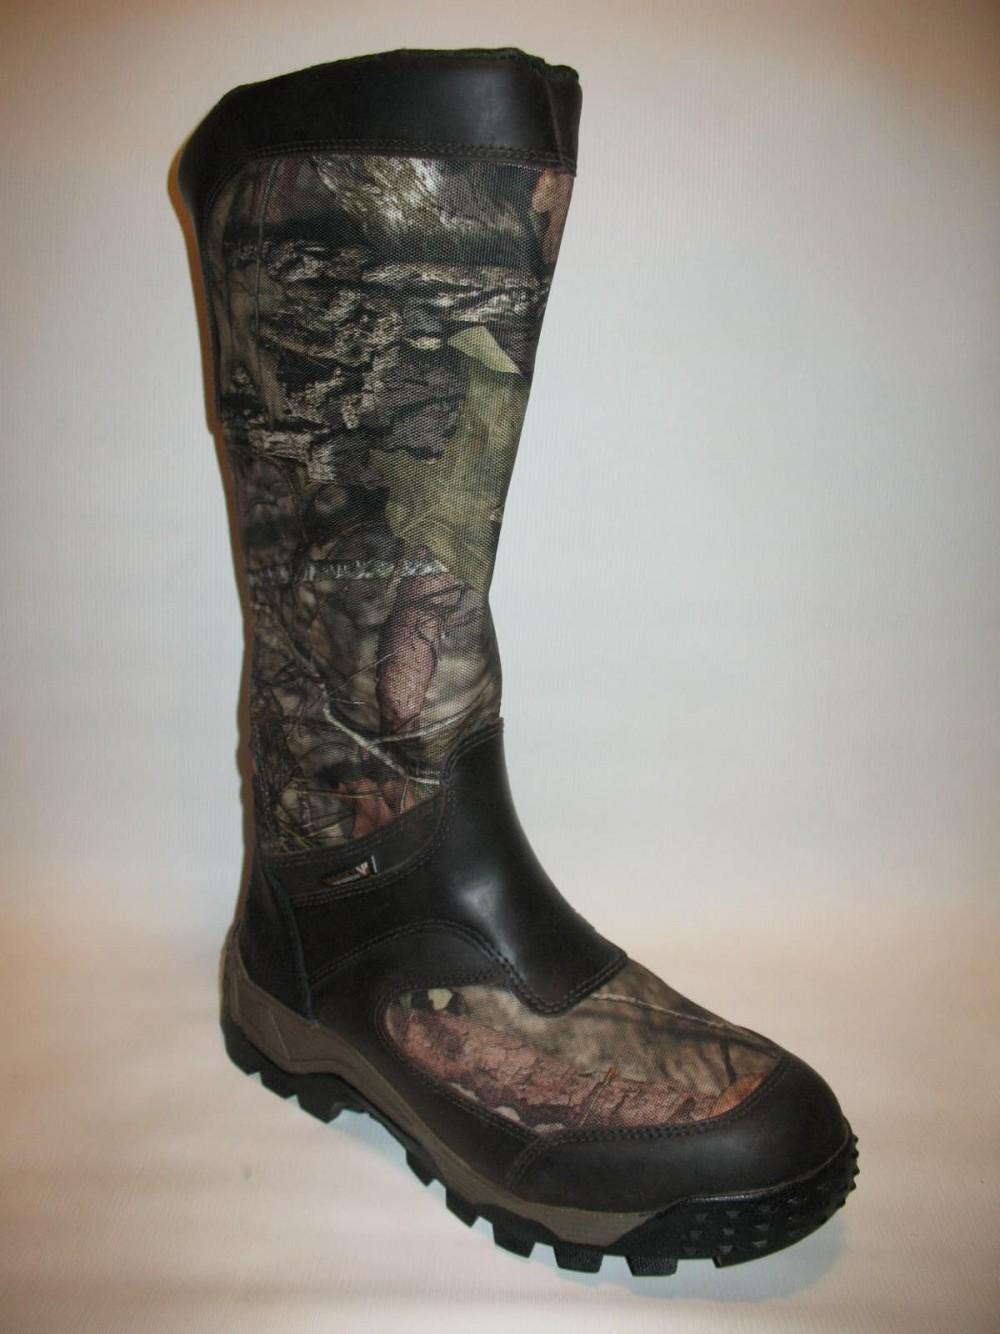 Ботинки ROCKY snake sport pro 16 boots (размер UK7,5/US8,5/EU42(на стопу до 270 mm)) - 7